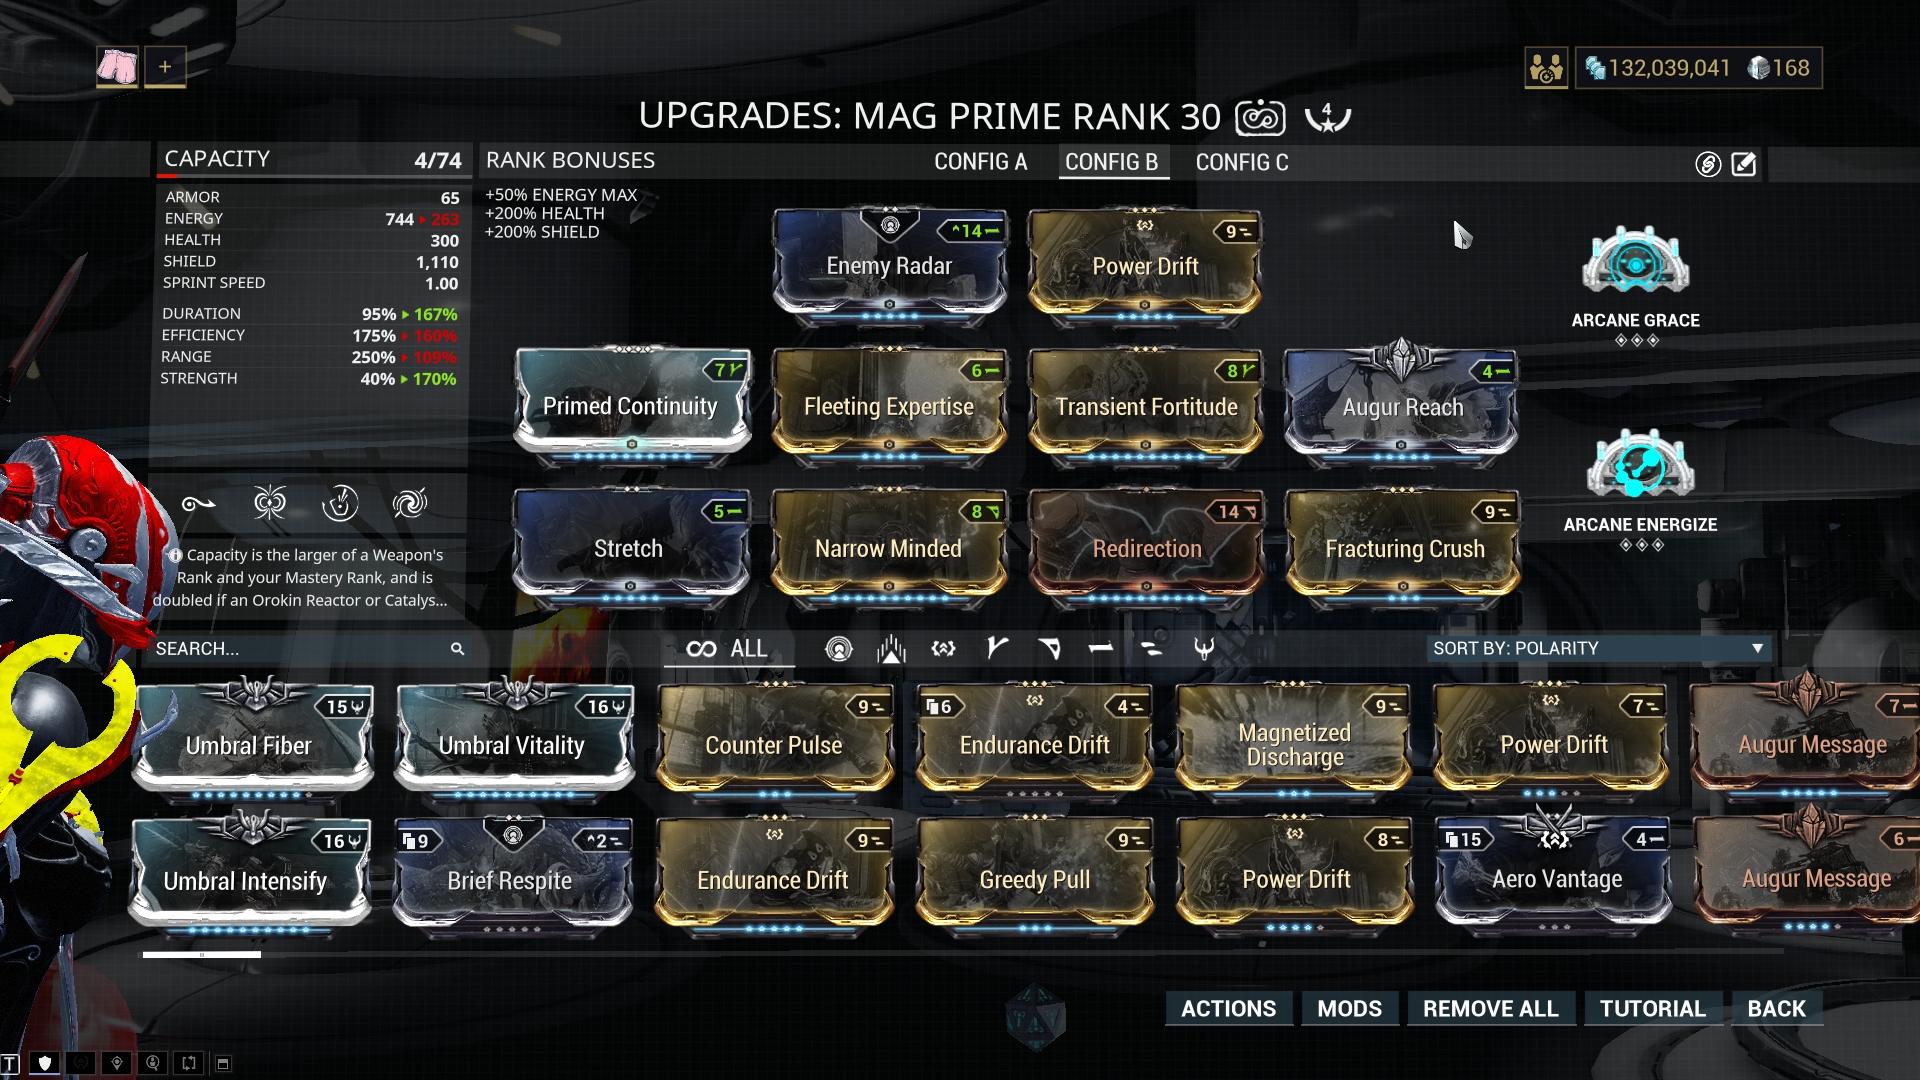 Mag Armor / Shield Depletion Build